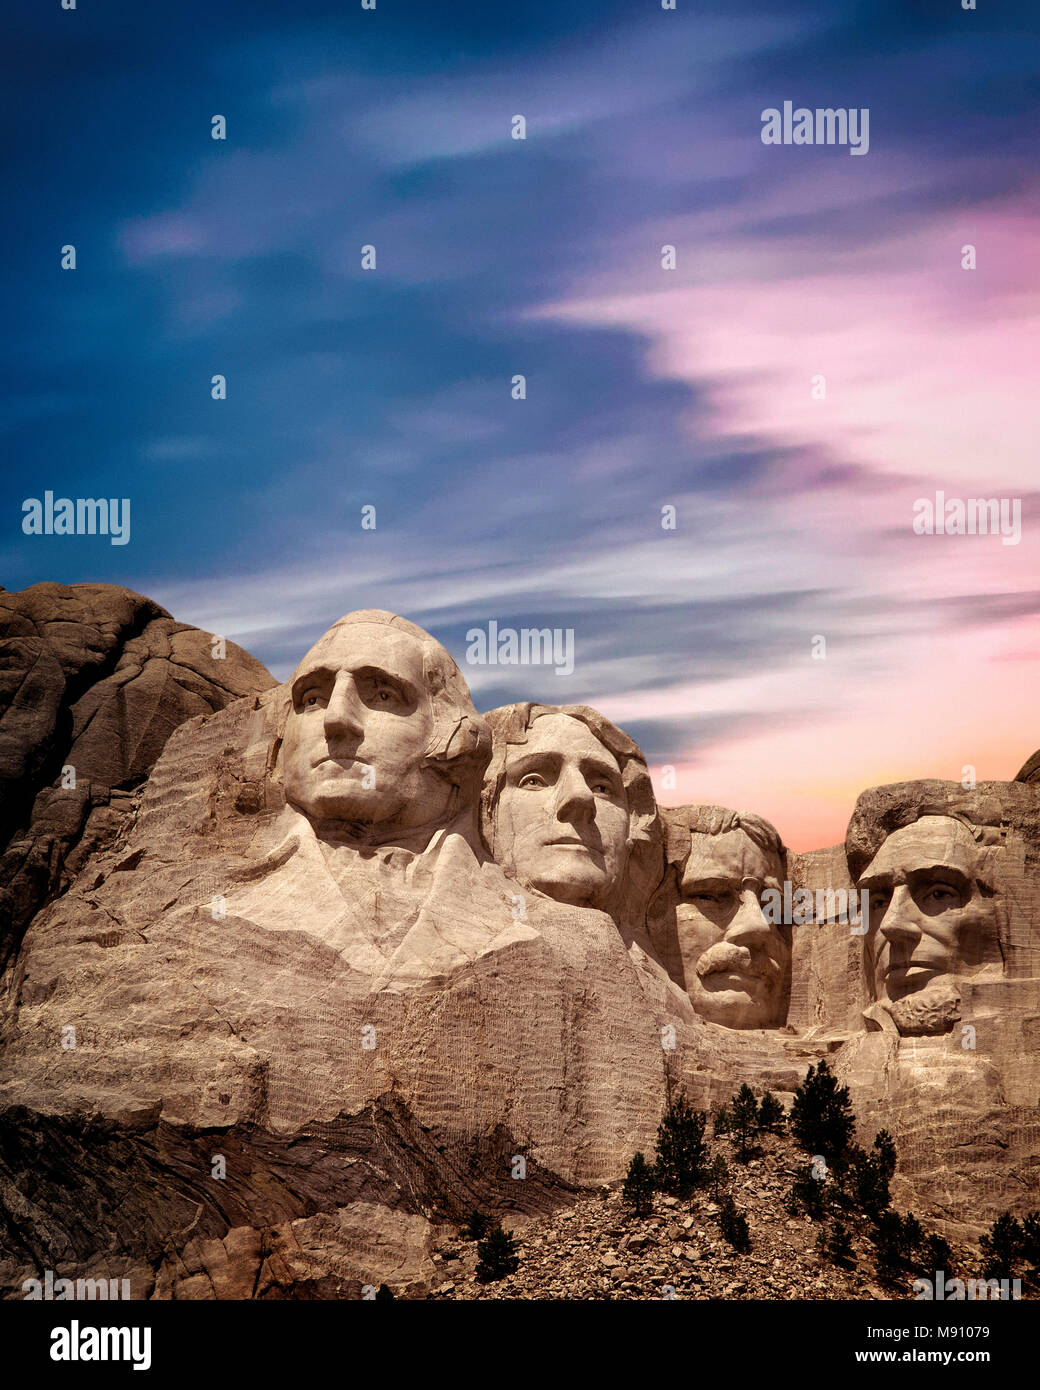 USA - DAKOTA DU SUD: Mont Rushmore National Memorial Photo Stock